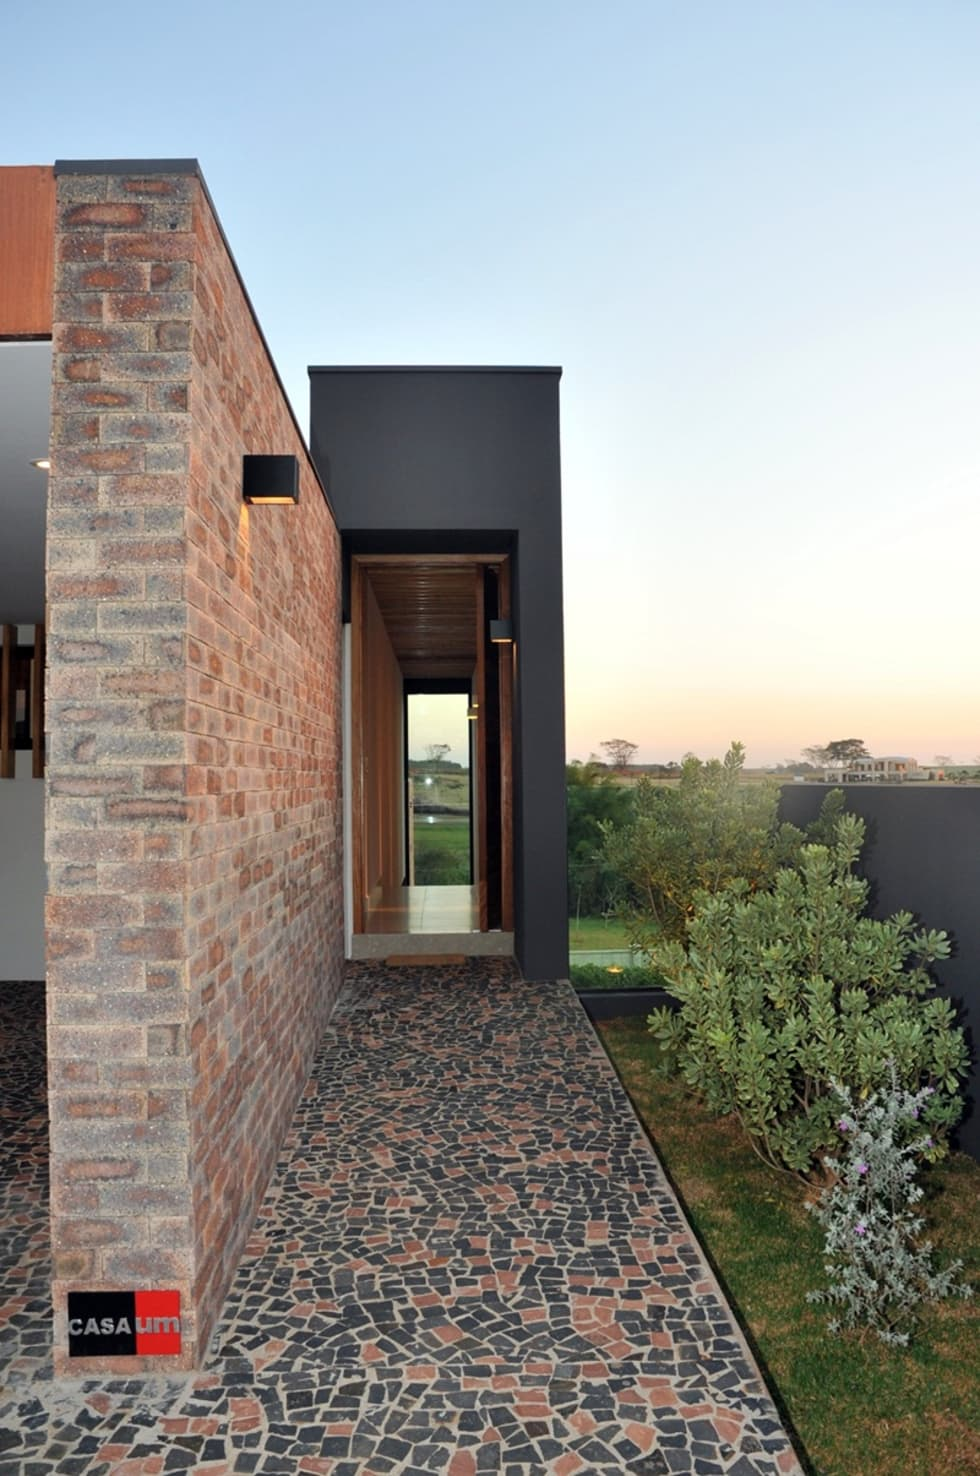 Fotos de decora o design de interiores e reformas homify for Casa quinta moderna